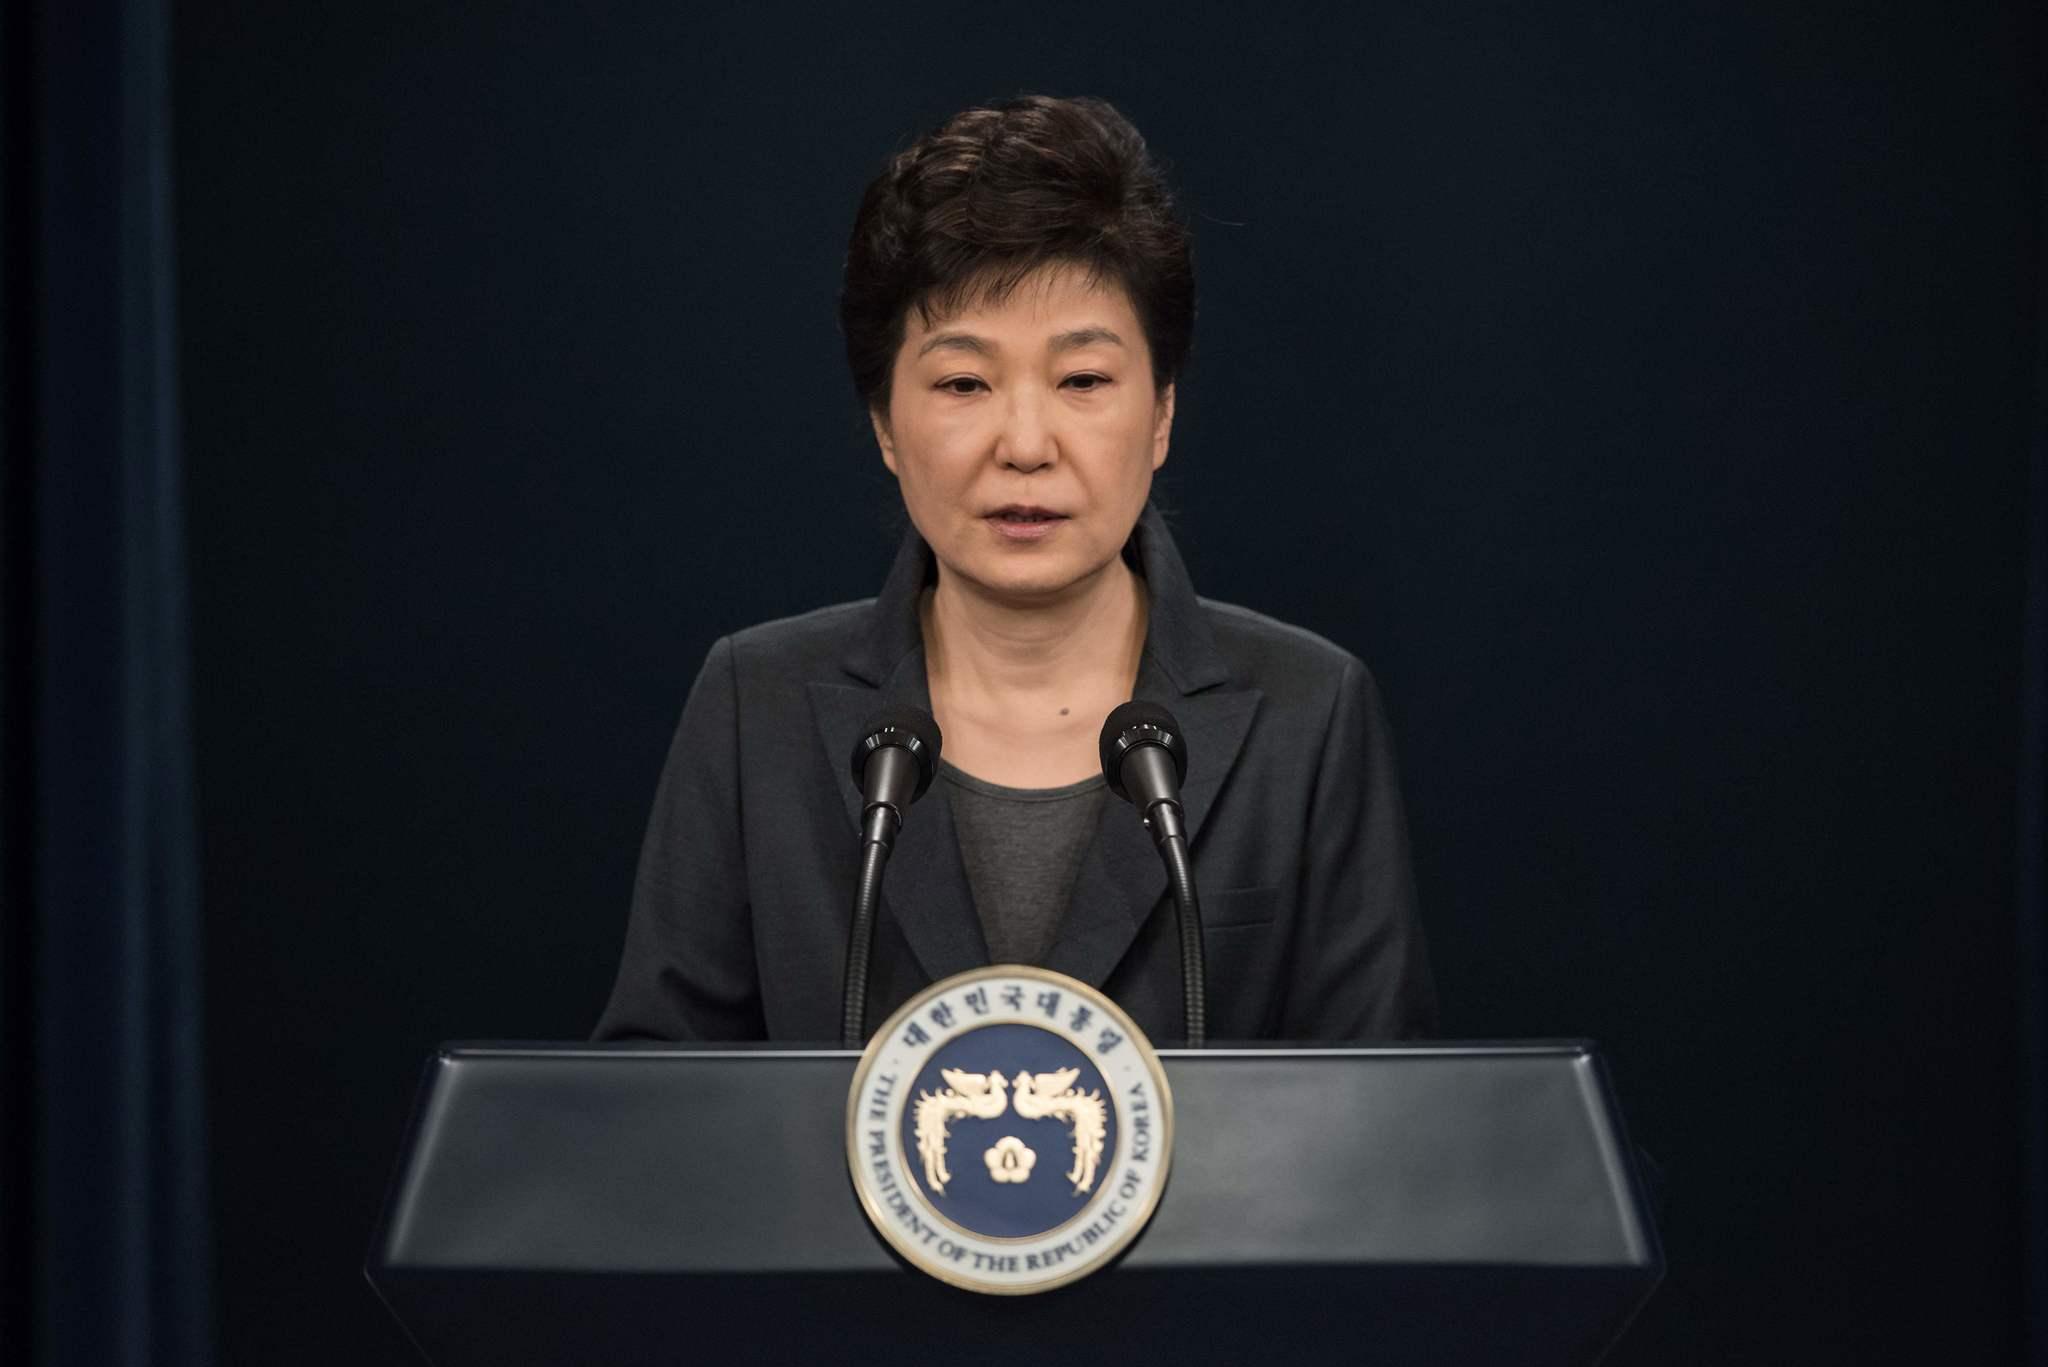 ... Embattled South Korean president issues astonishing apology amid scandal